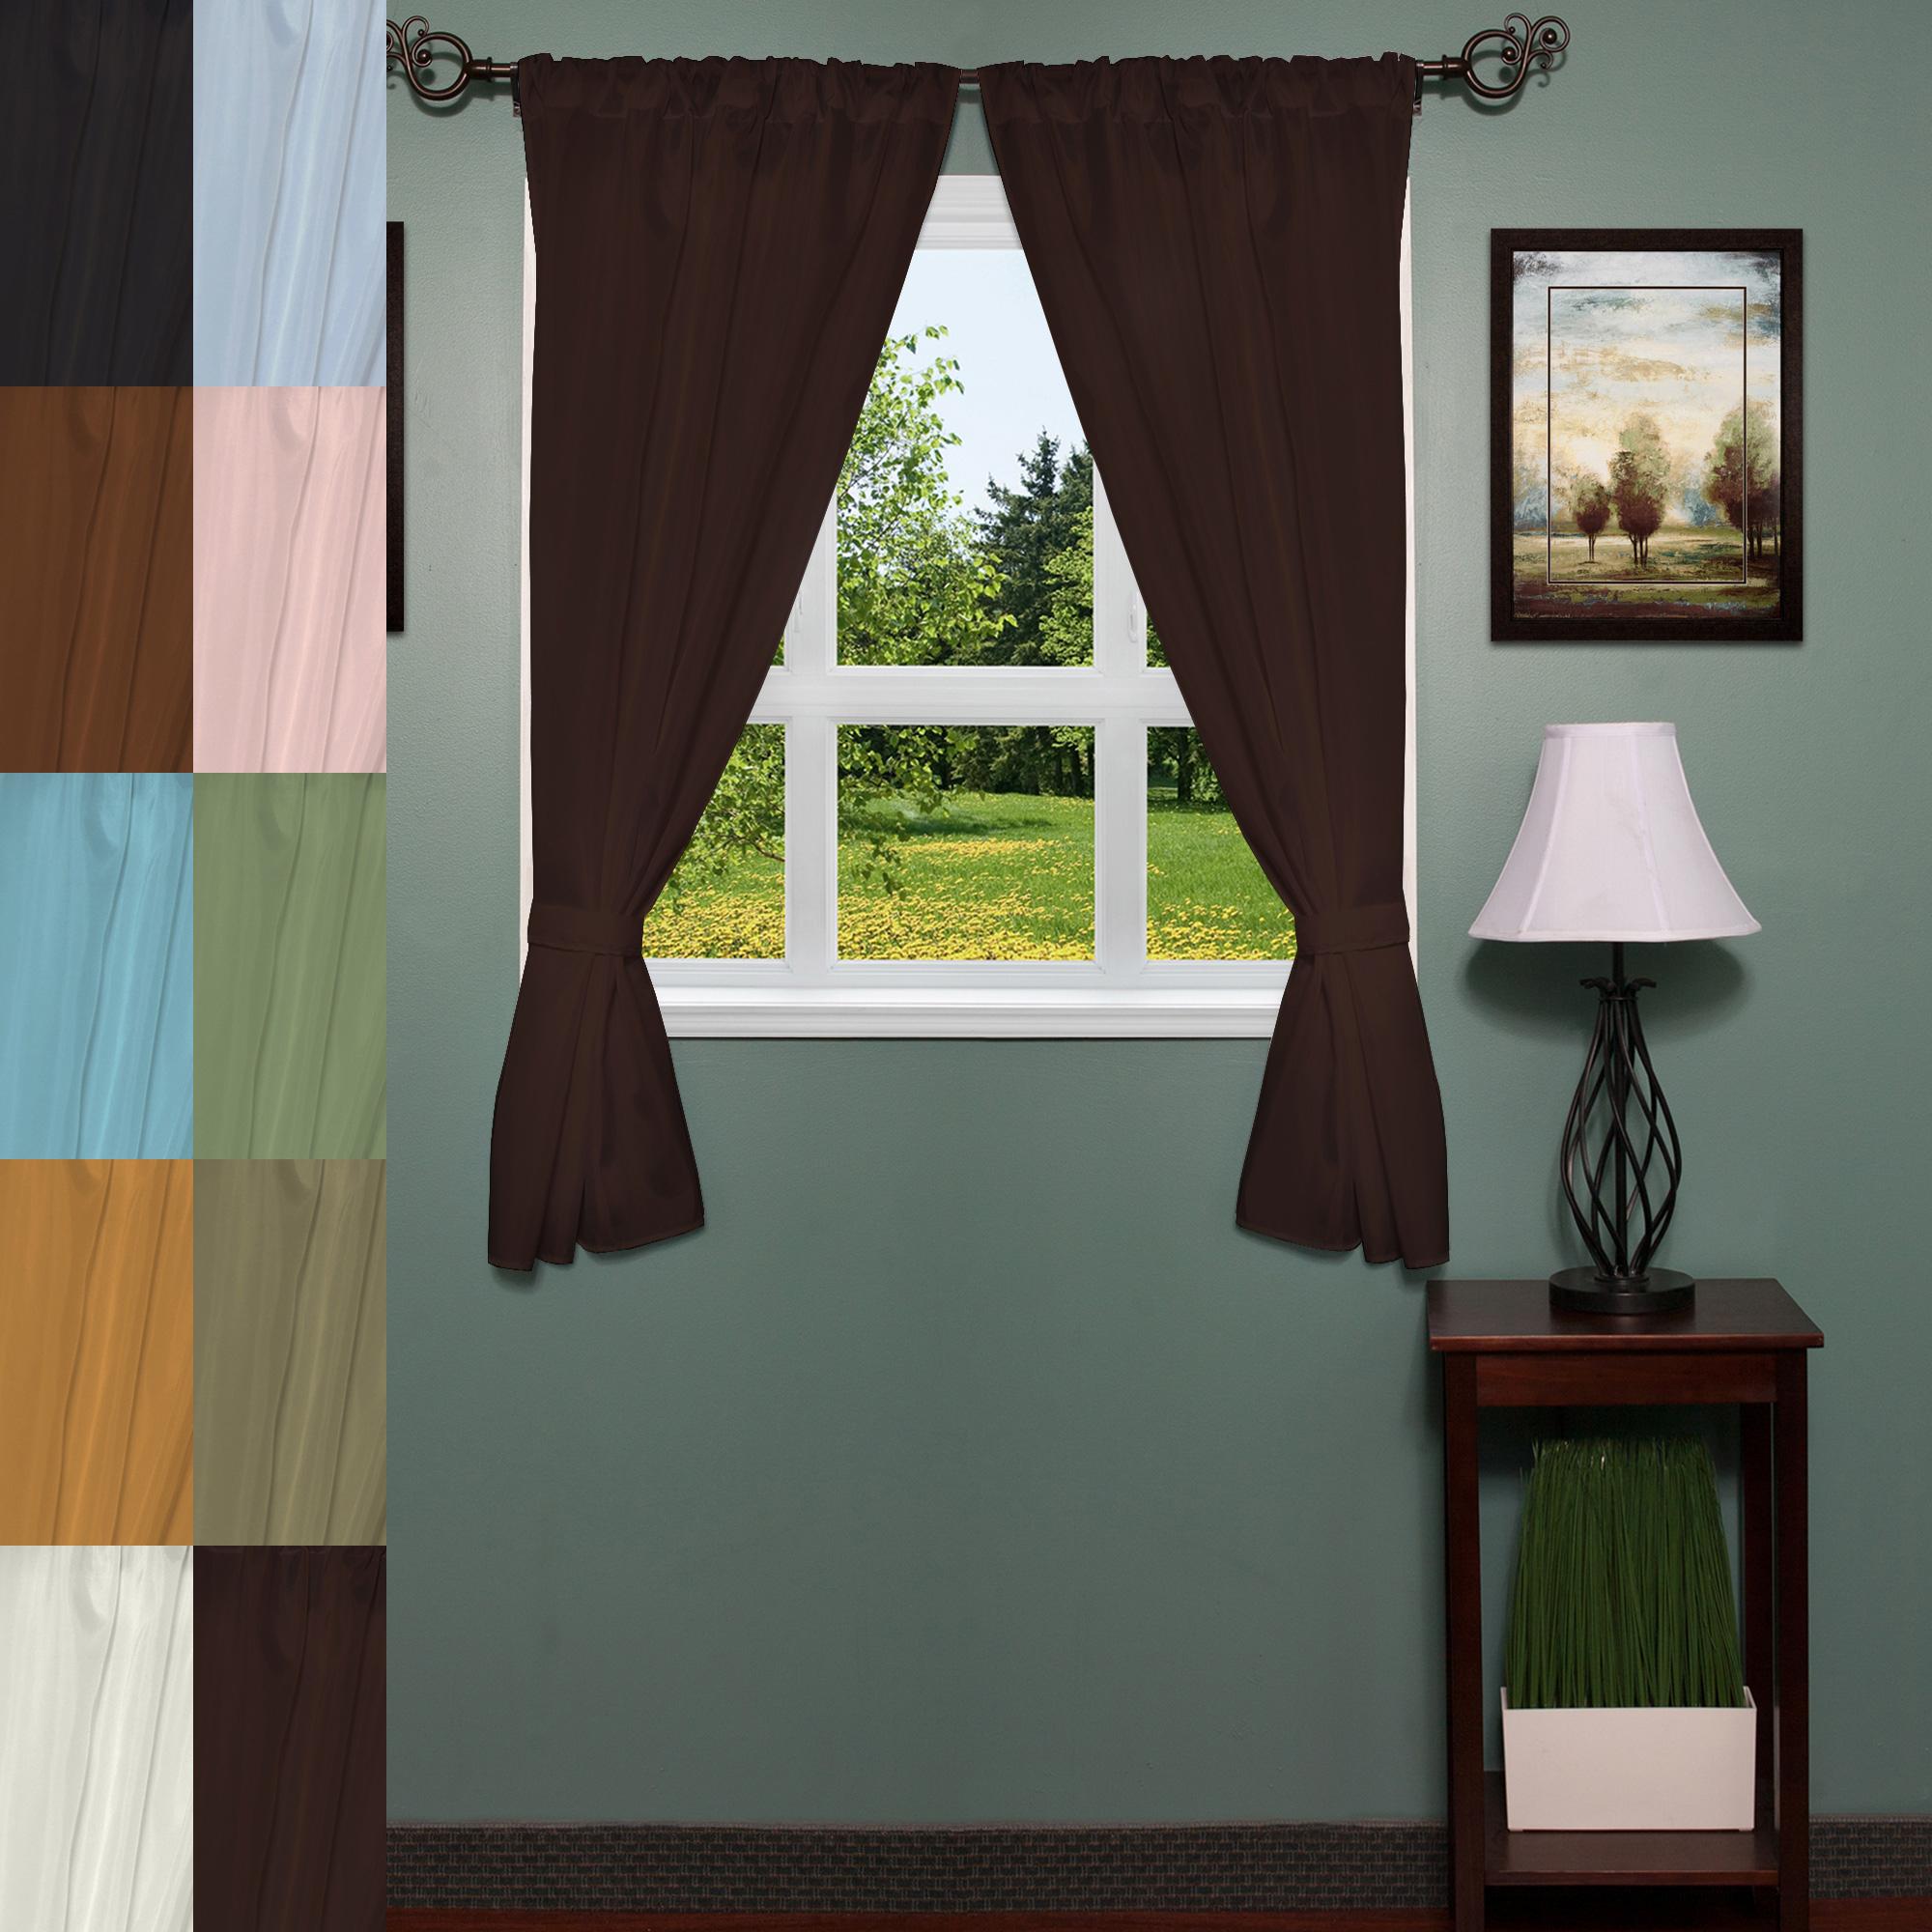 "Details About Classic Hotel Quality 36""w X 54""l Fabric Bathroom Window Curtain Set W/tiebacks With Classic Hotel Quality Water Resistant Fabric Curtains Set With Tiebacks (View 9 of 20)"